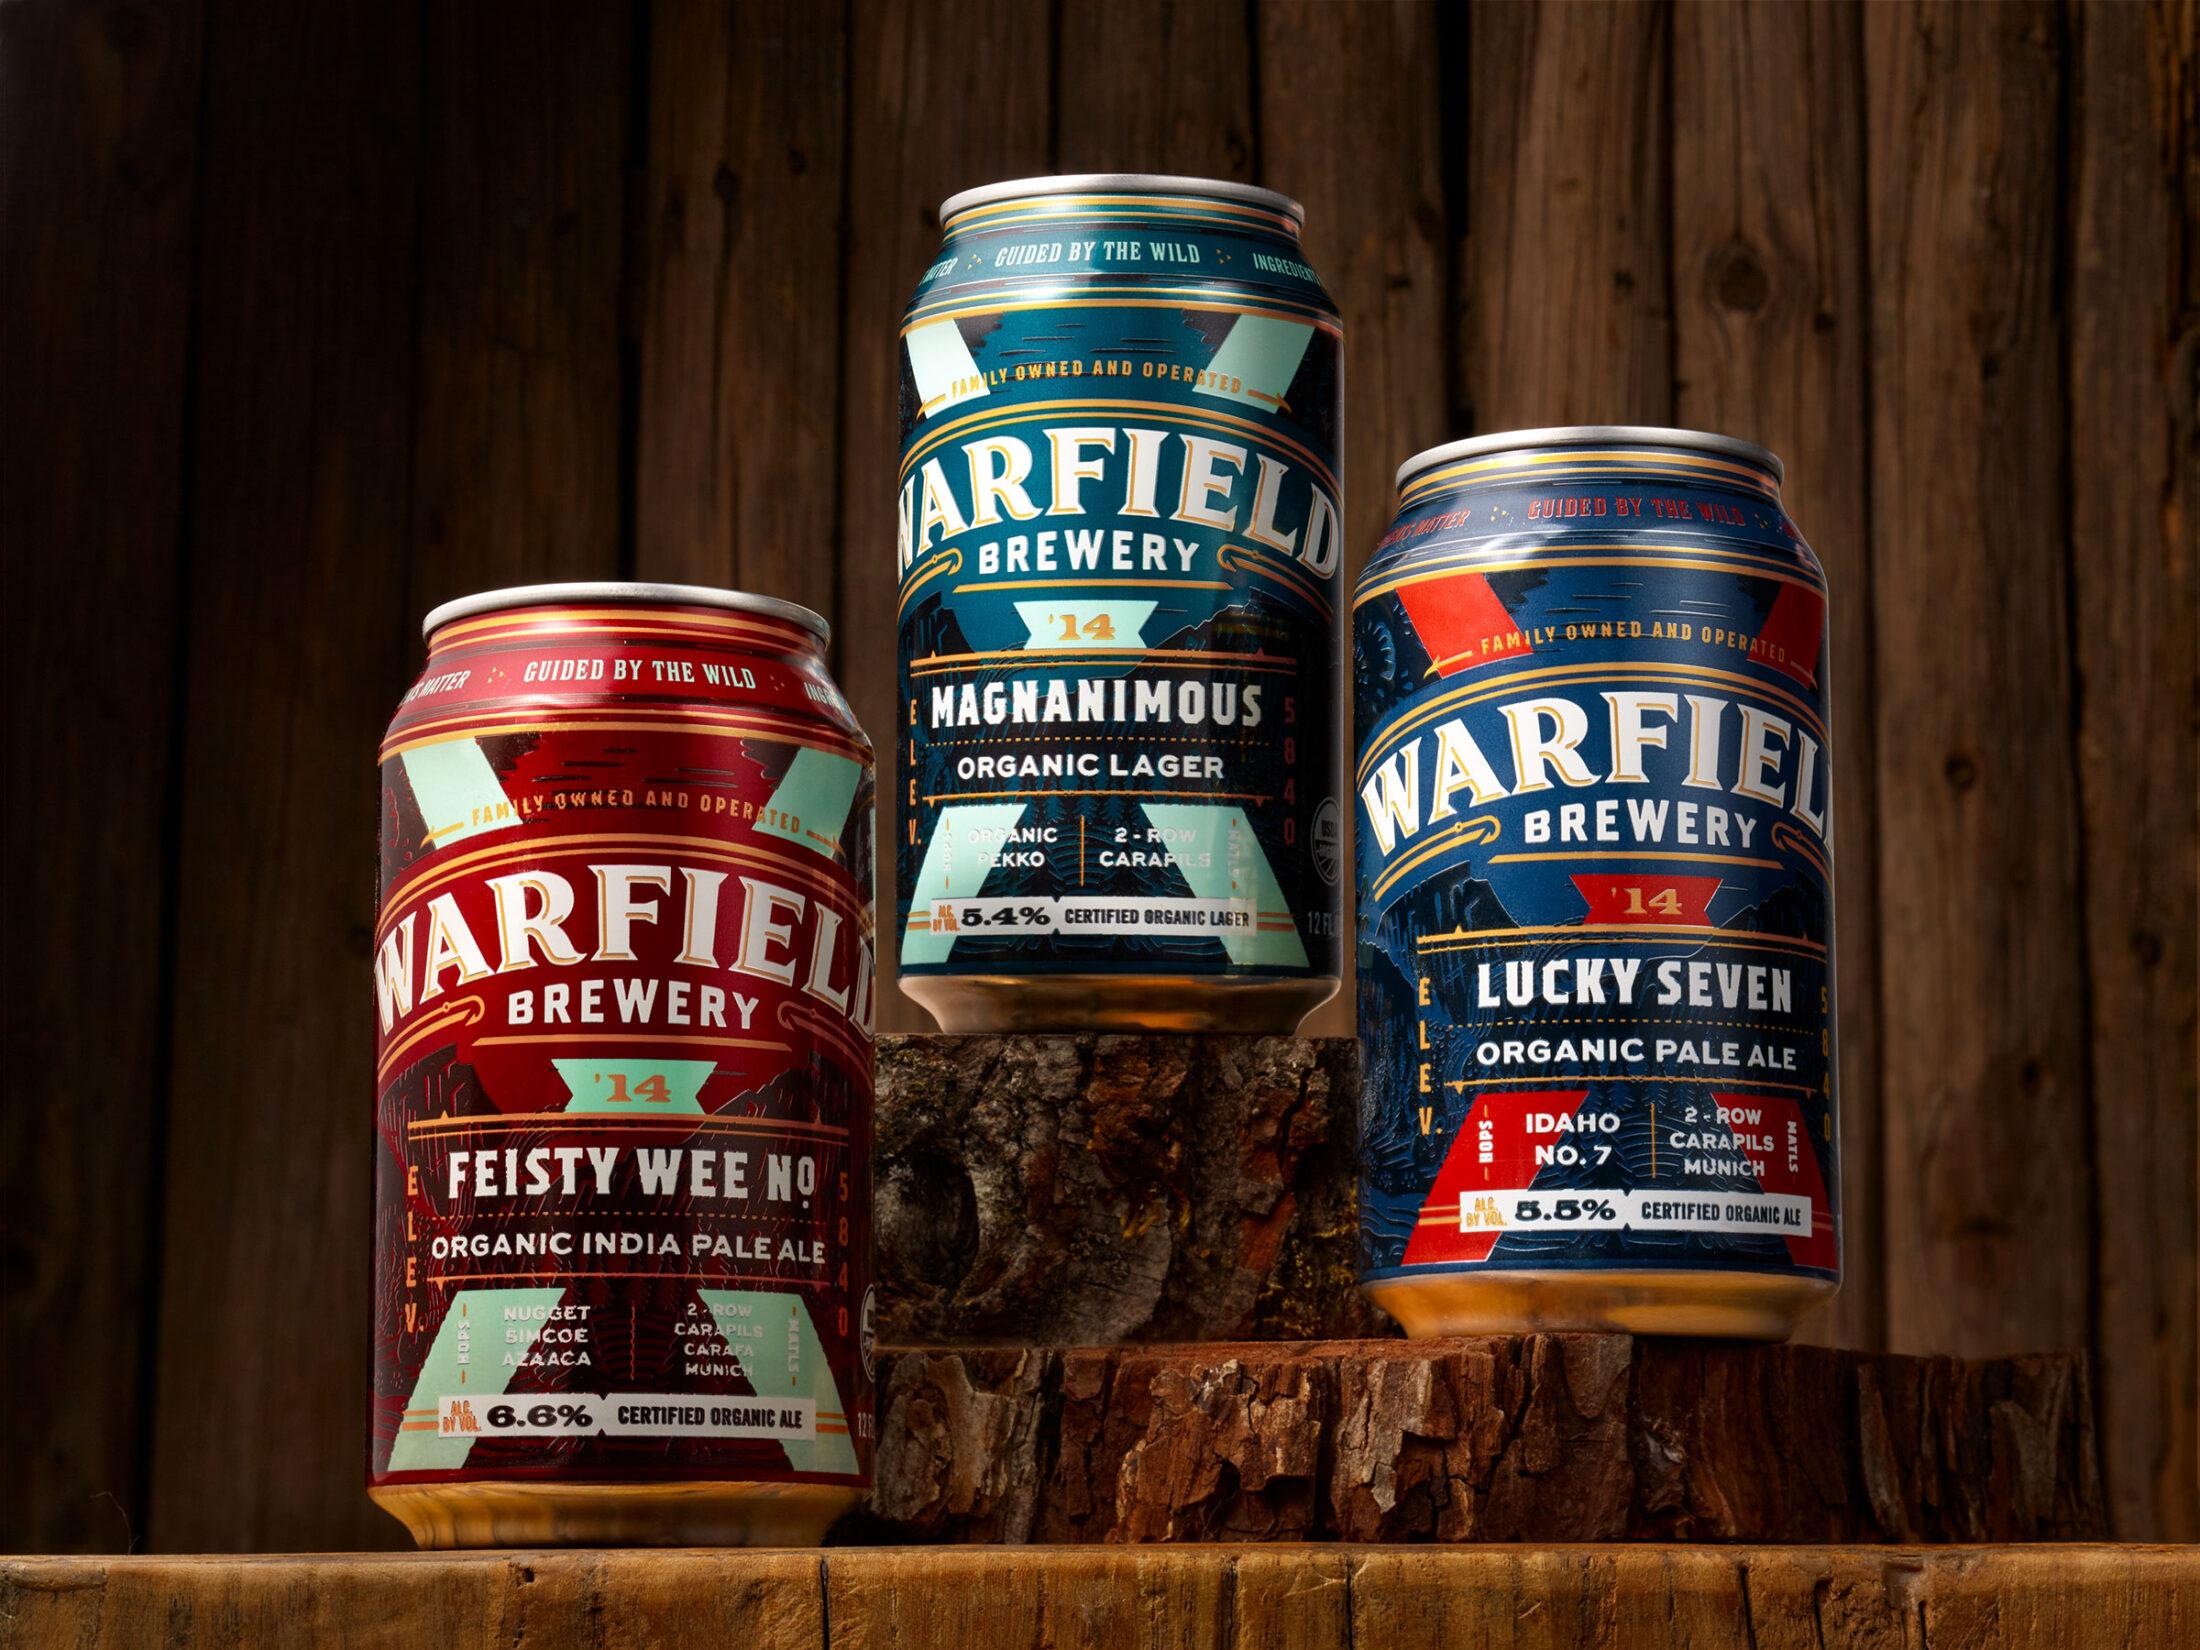 Warfield Brewing package design